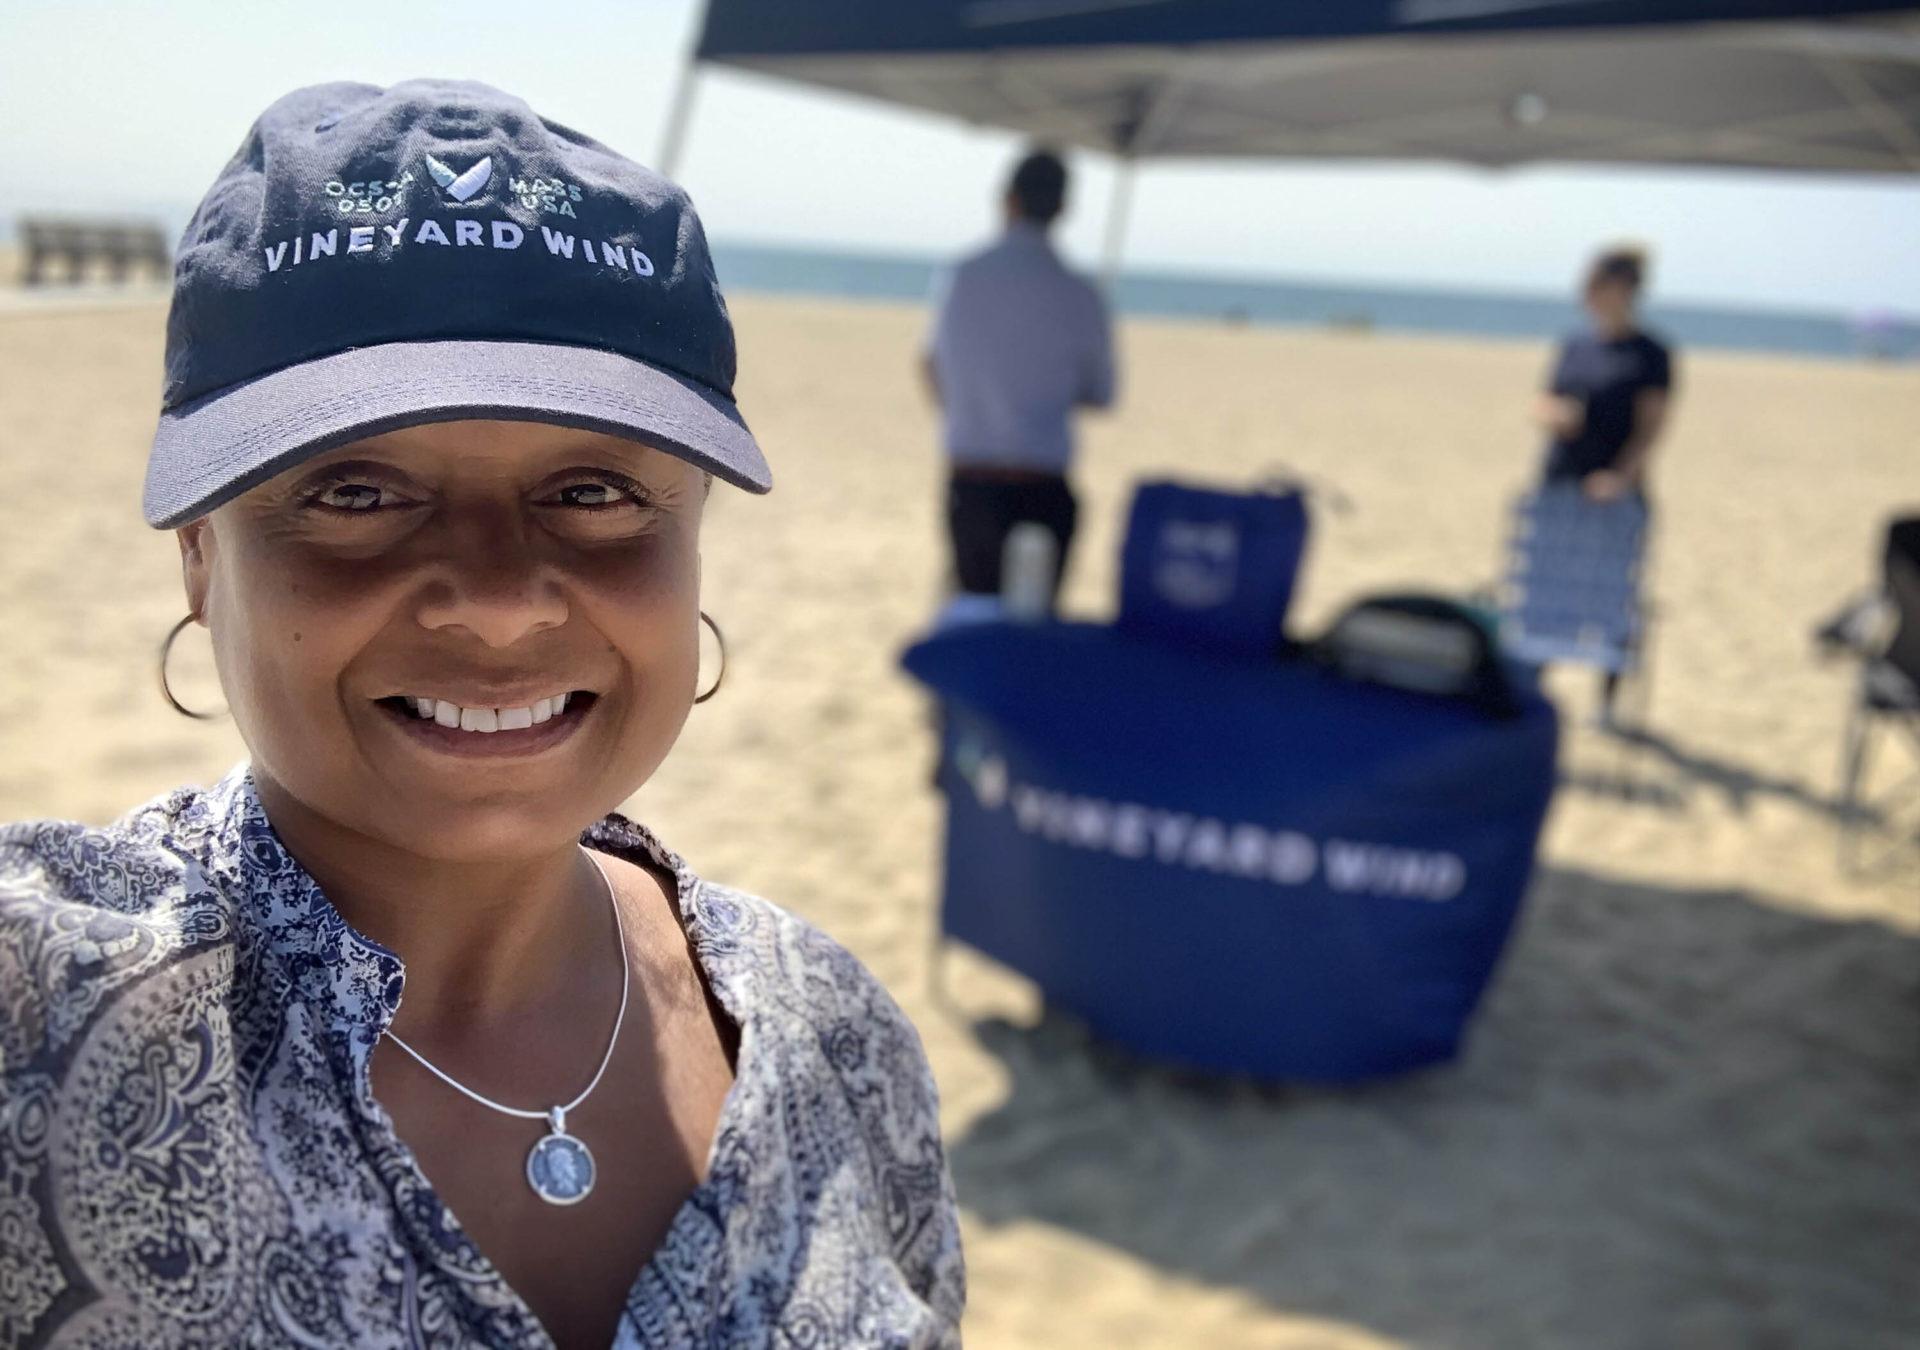 Vineyard Wind's Massachusetts Liaison Dana Rebeiro, at an outreach event on Covell's Beach in Cape Cod. (Courtesy Dana Rebeiro)